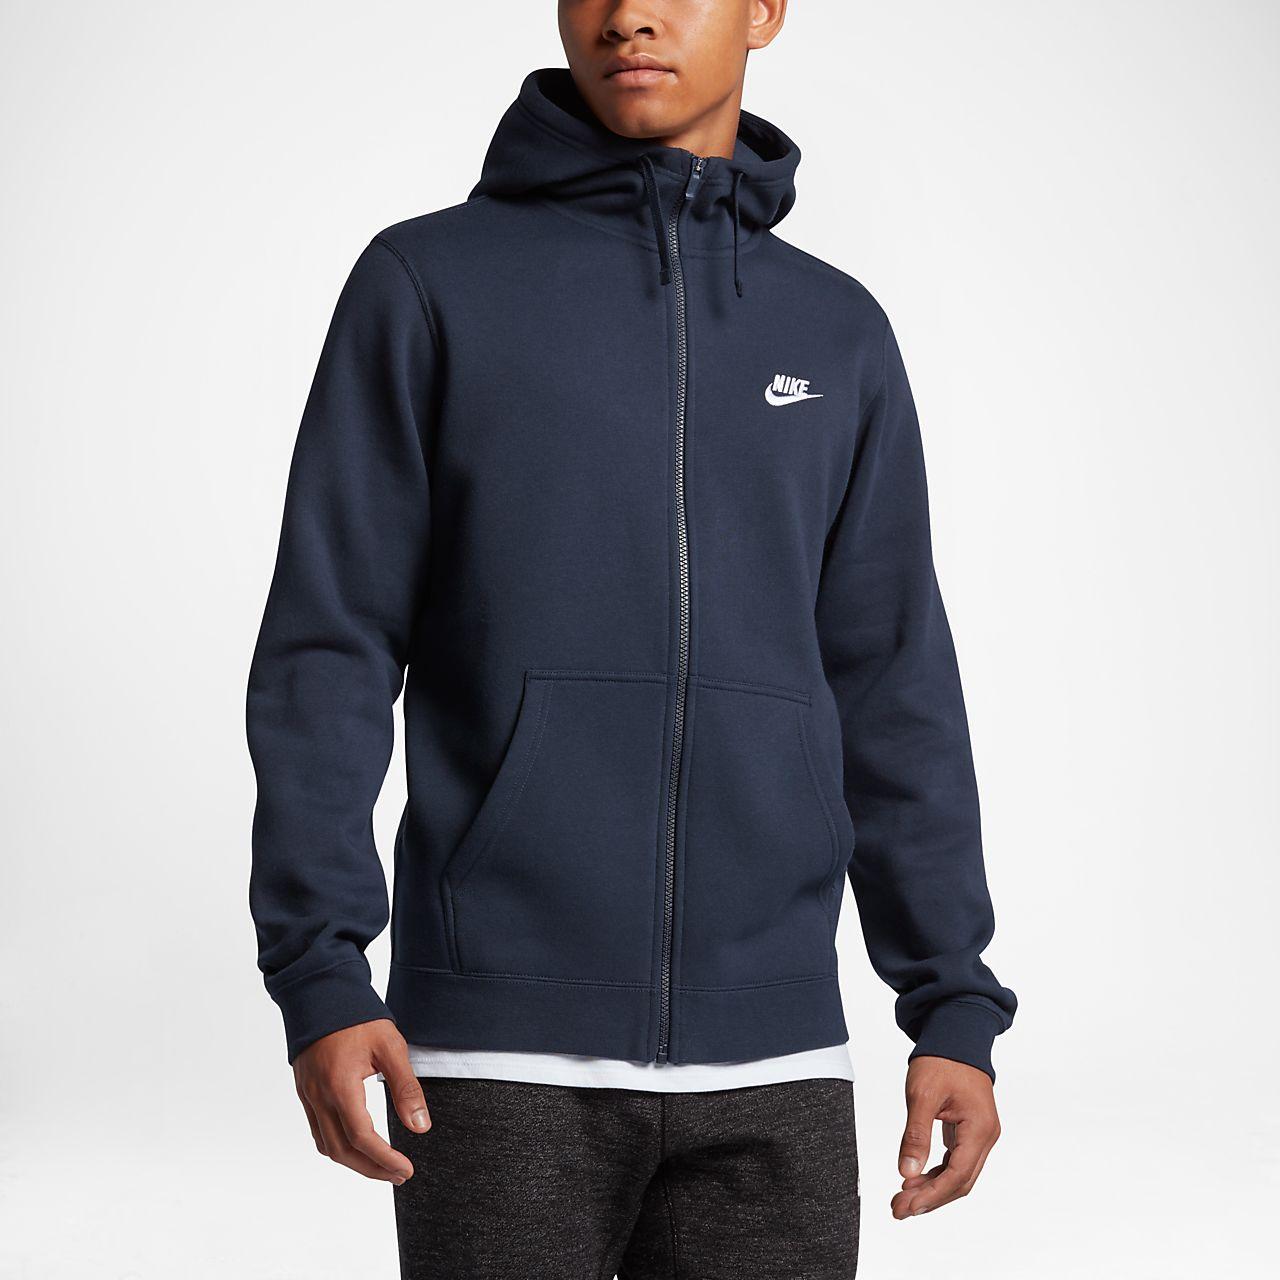 05f3d116015c Nike Sportswear Club Fleece Men s Hoodie. Nike.com HU